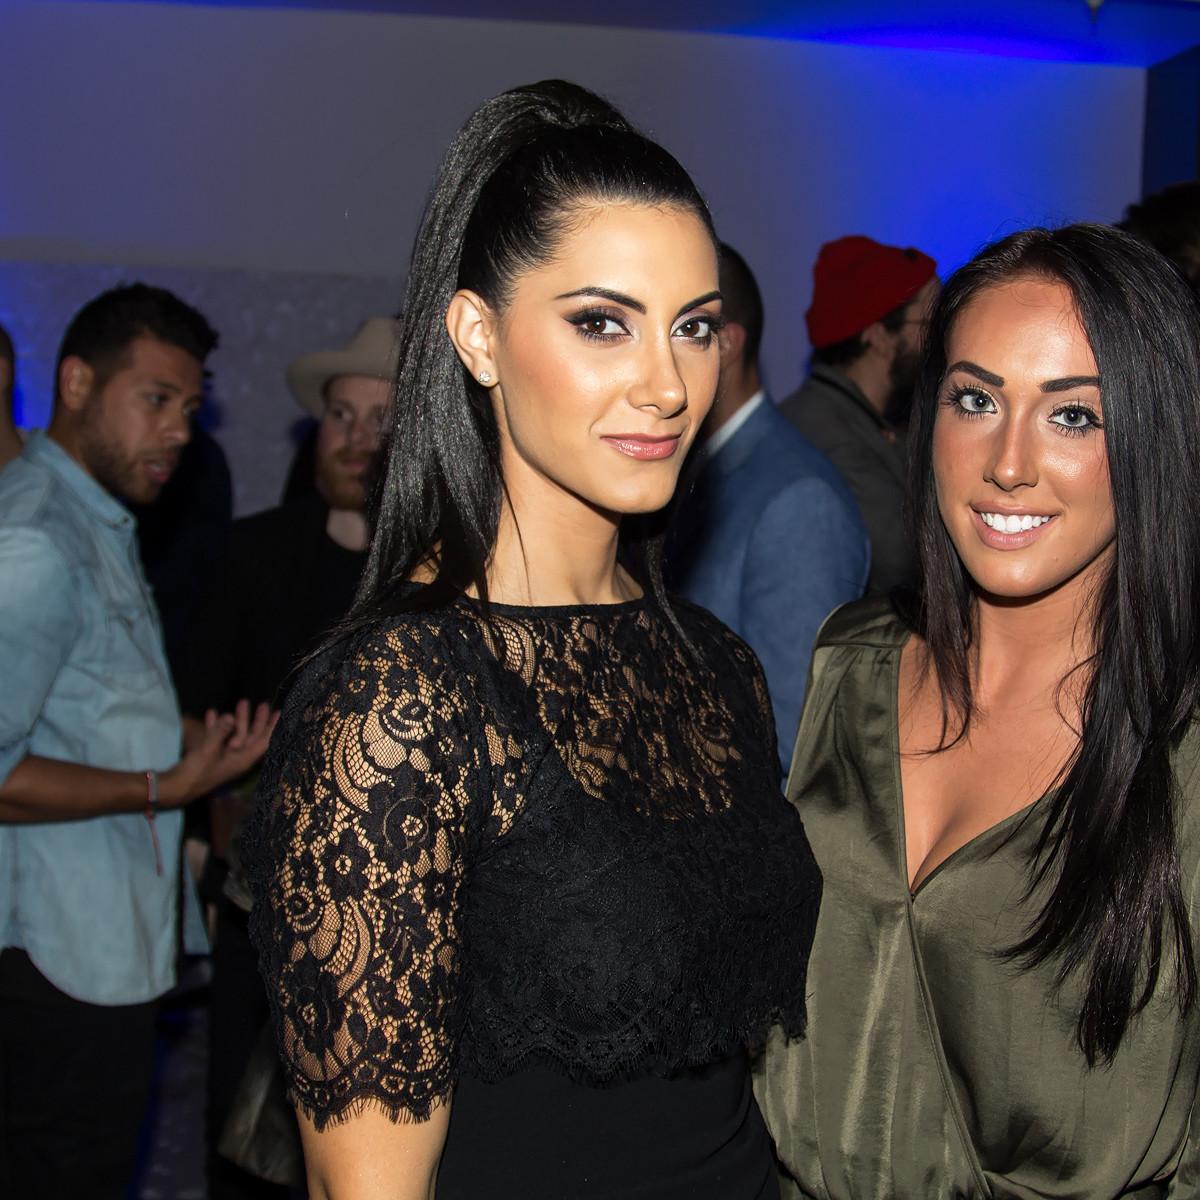 Natalie Sheikh, Alyssa Yannuzzi